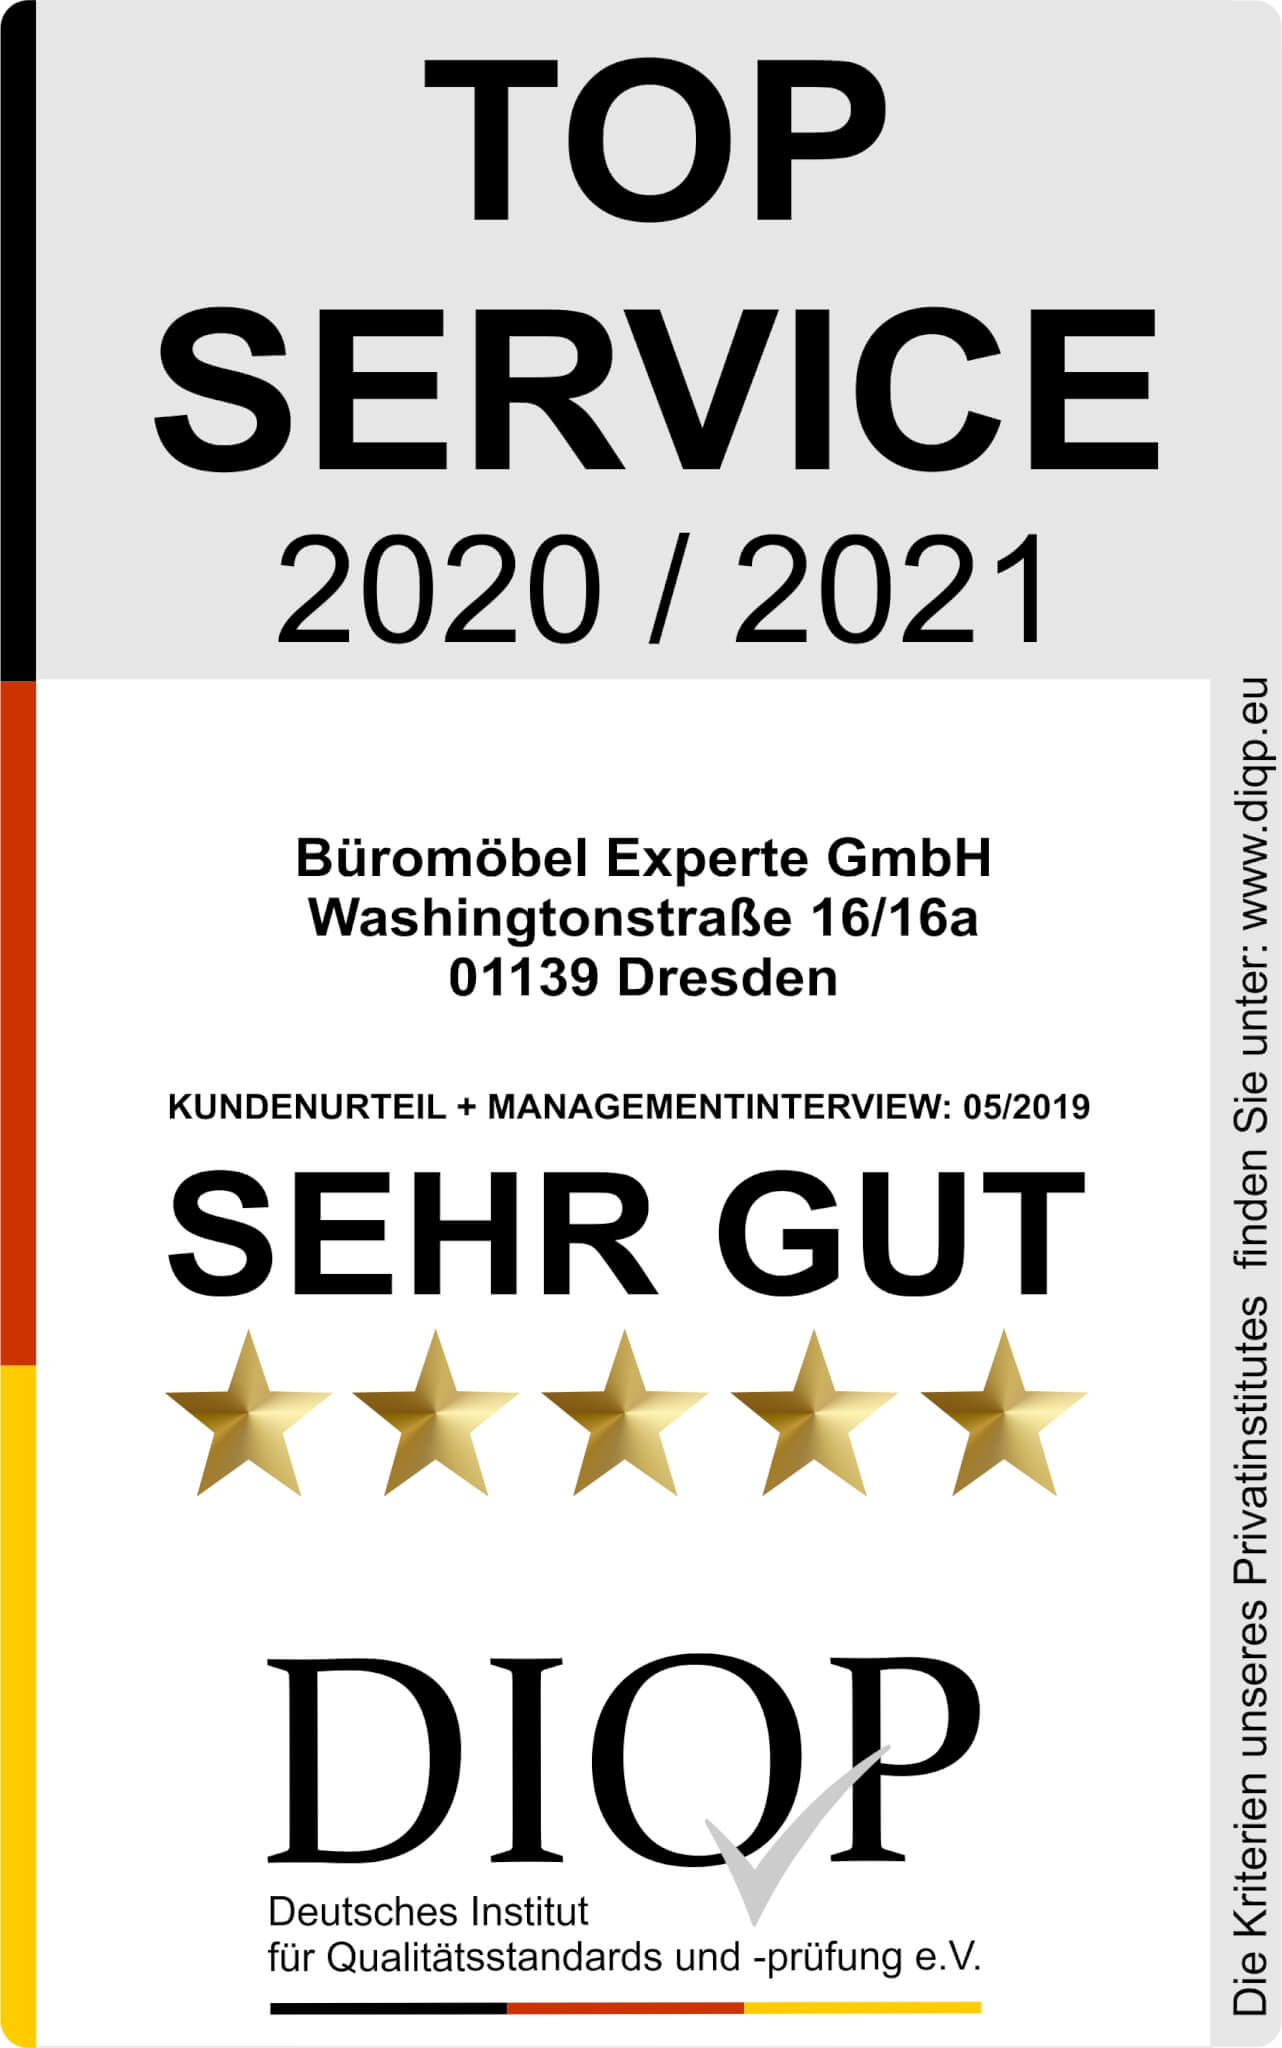 Top Service (DIQP) Büromöbel Experte 2020